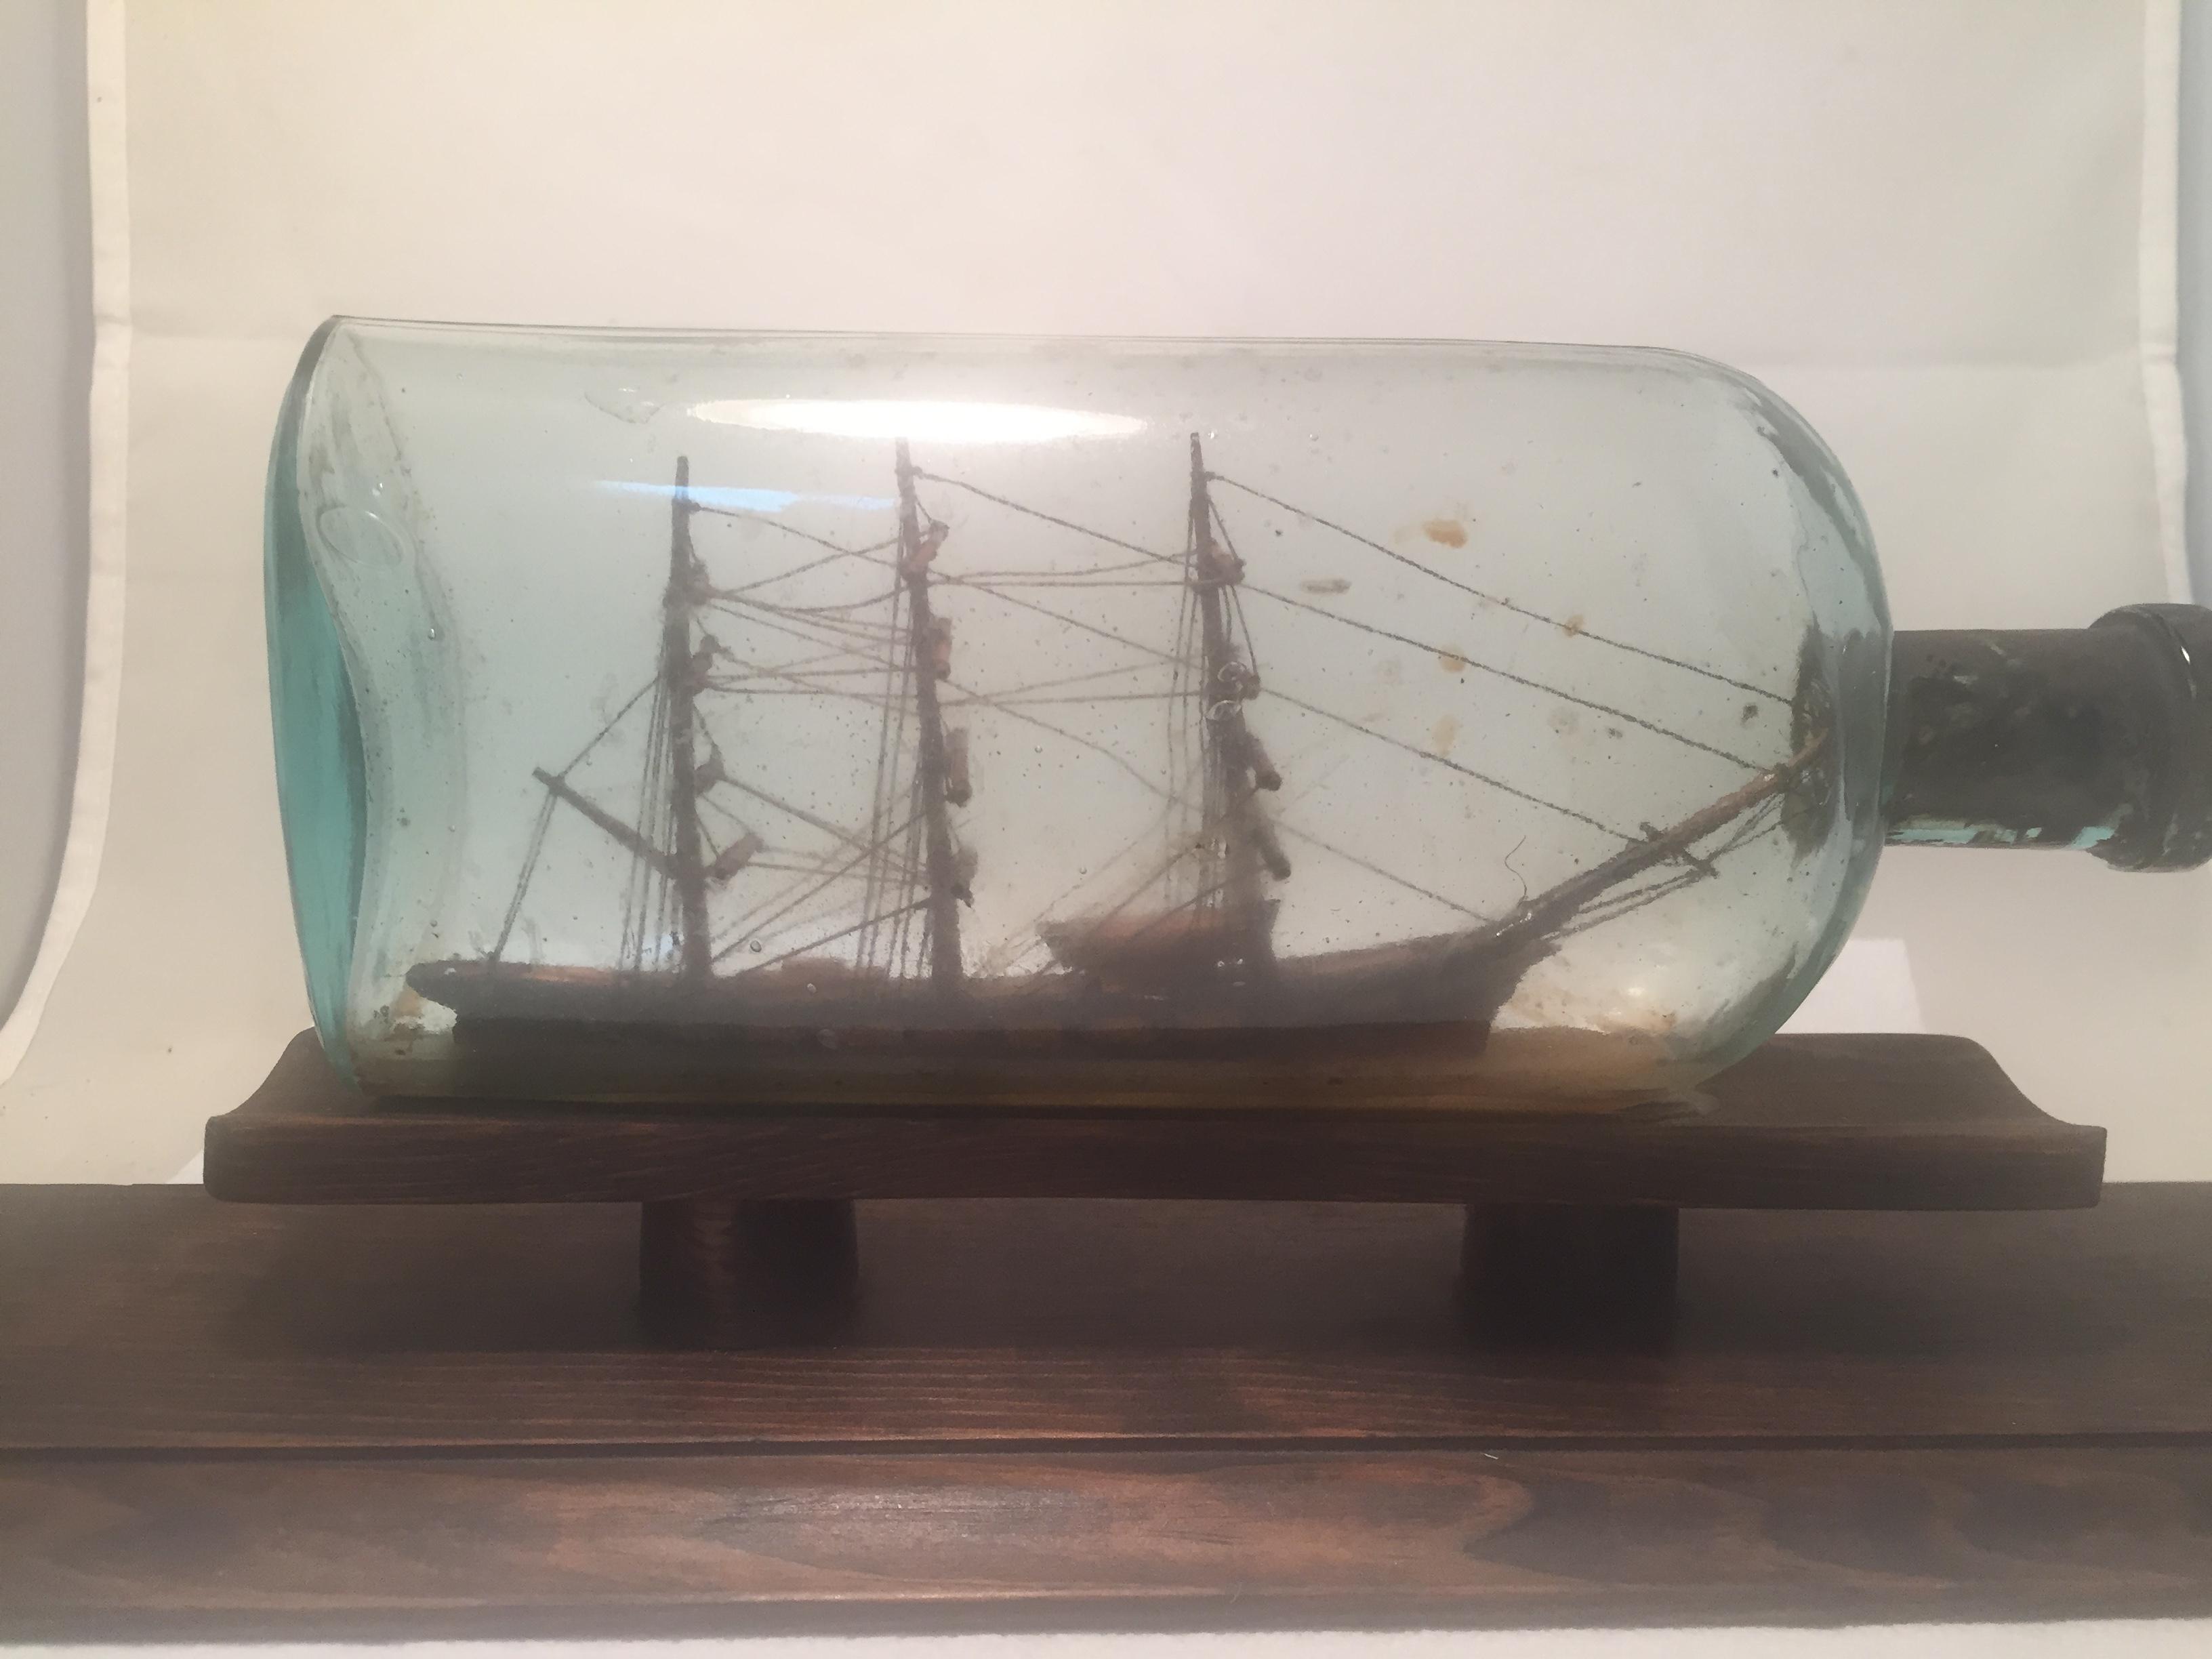 antique ship in a botttle